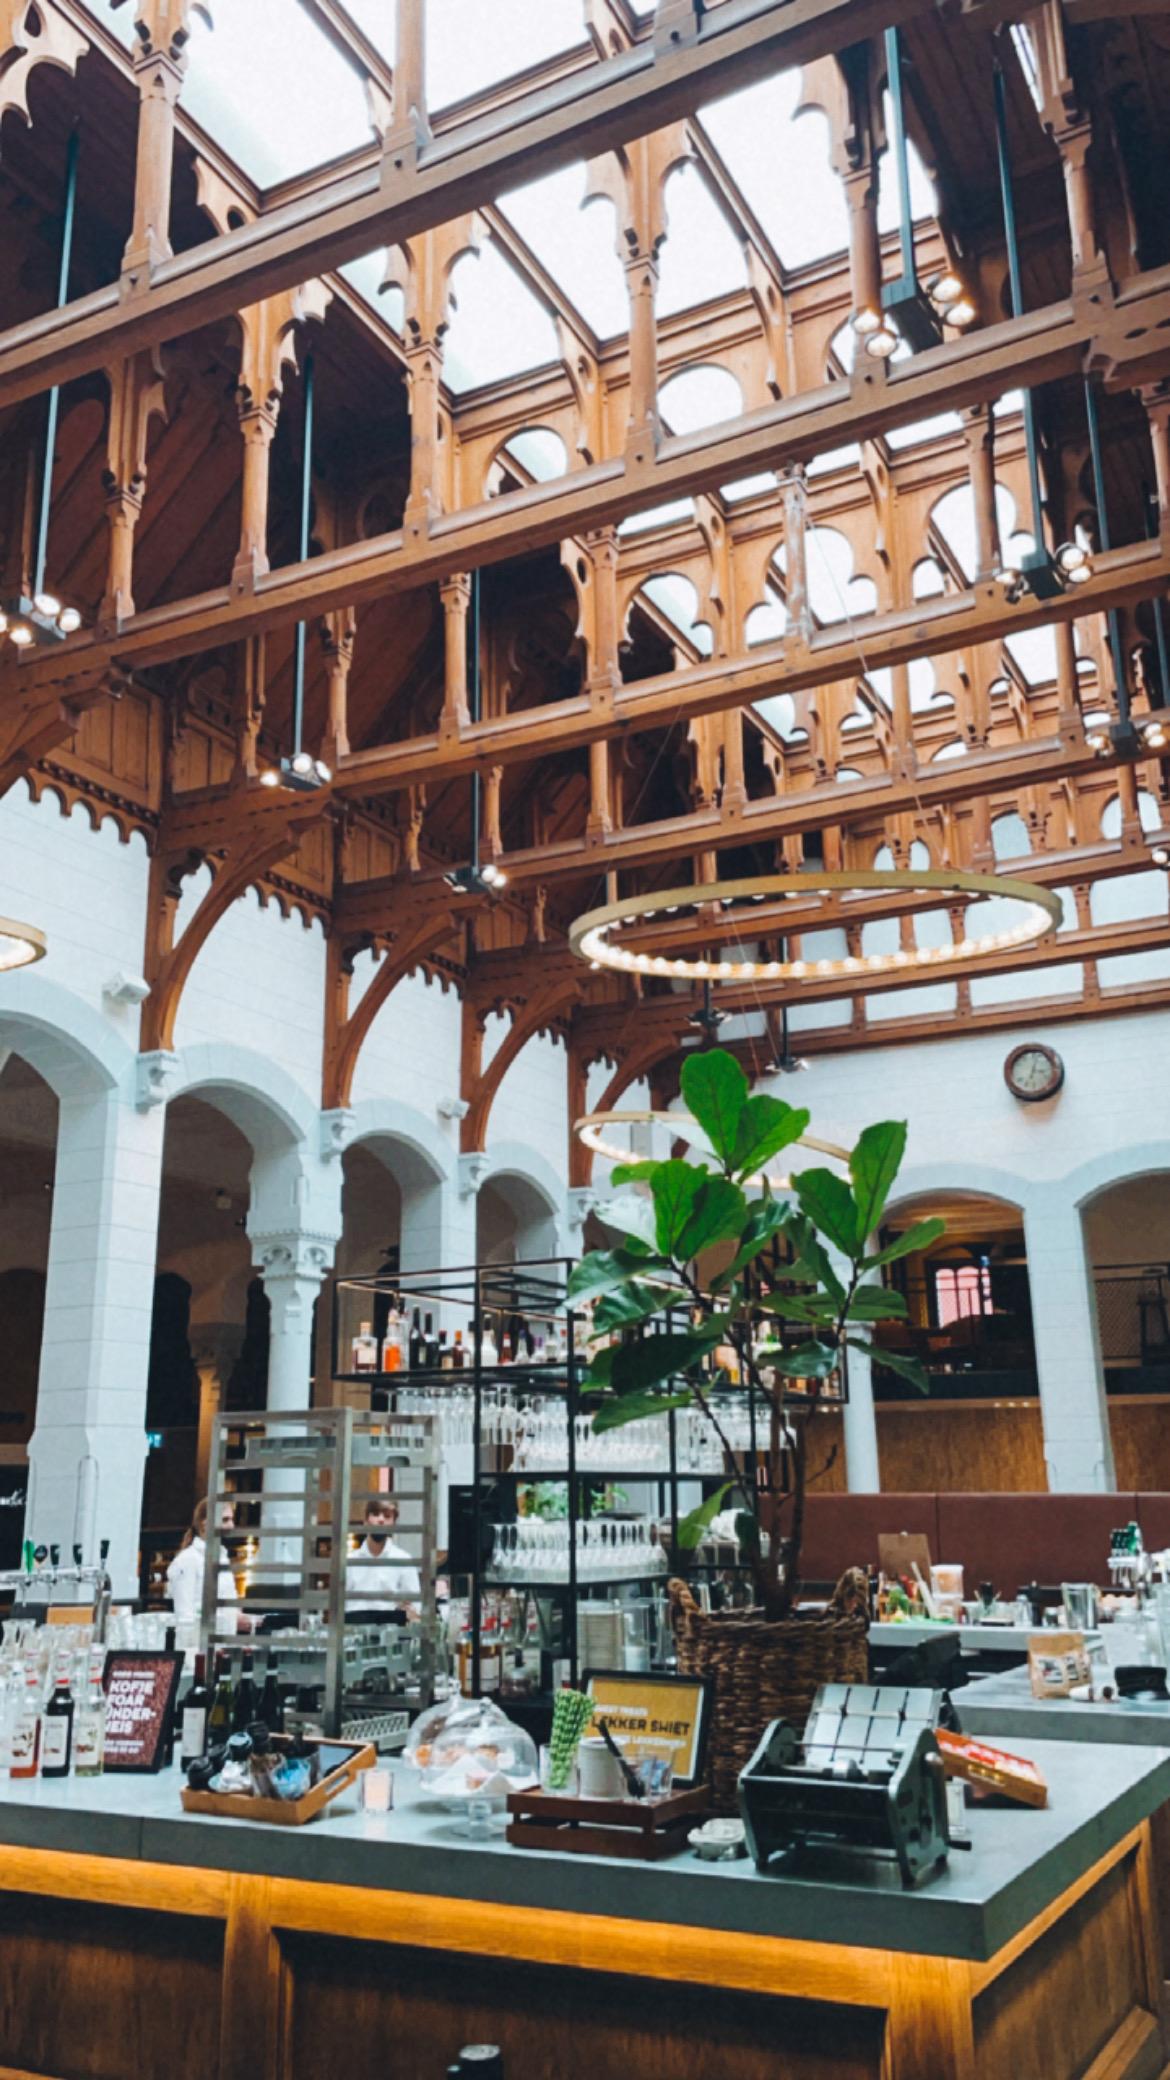 Post plaza hotel in leeuwarden grand cafe